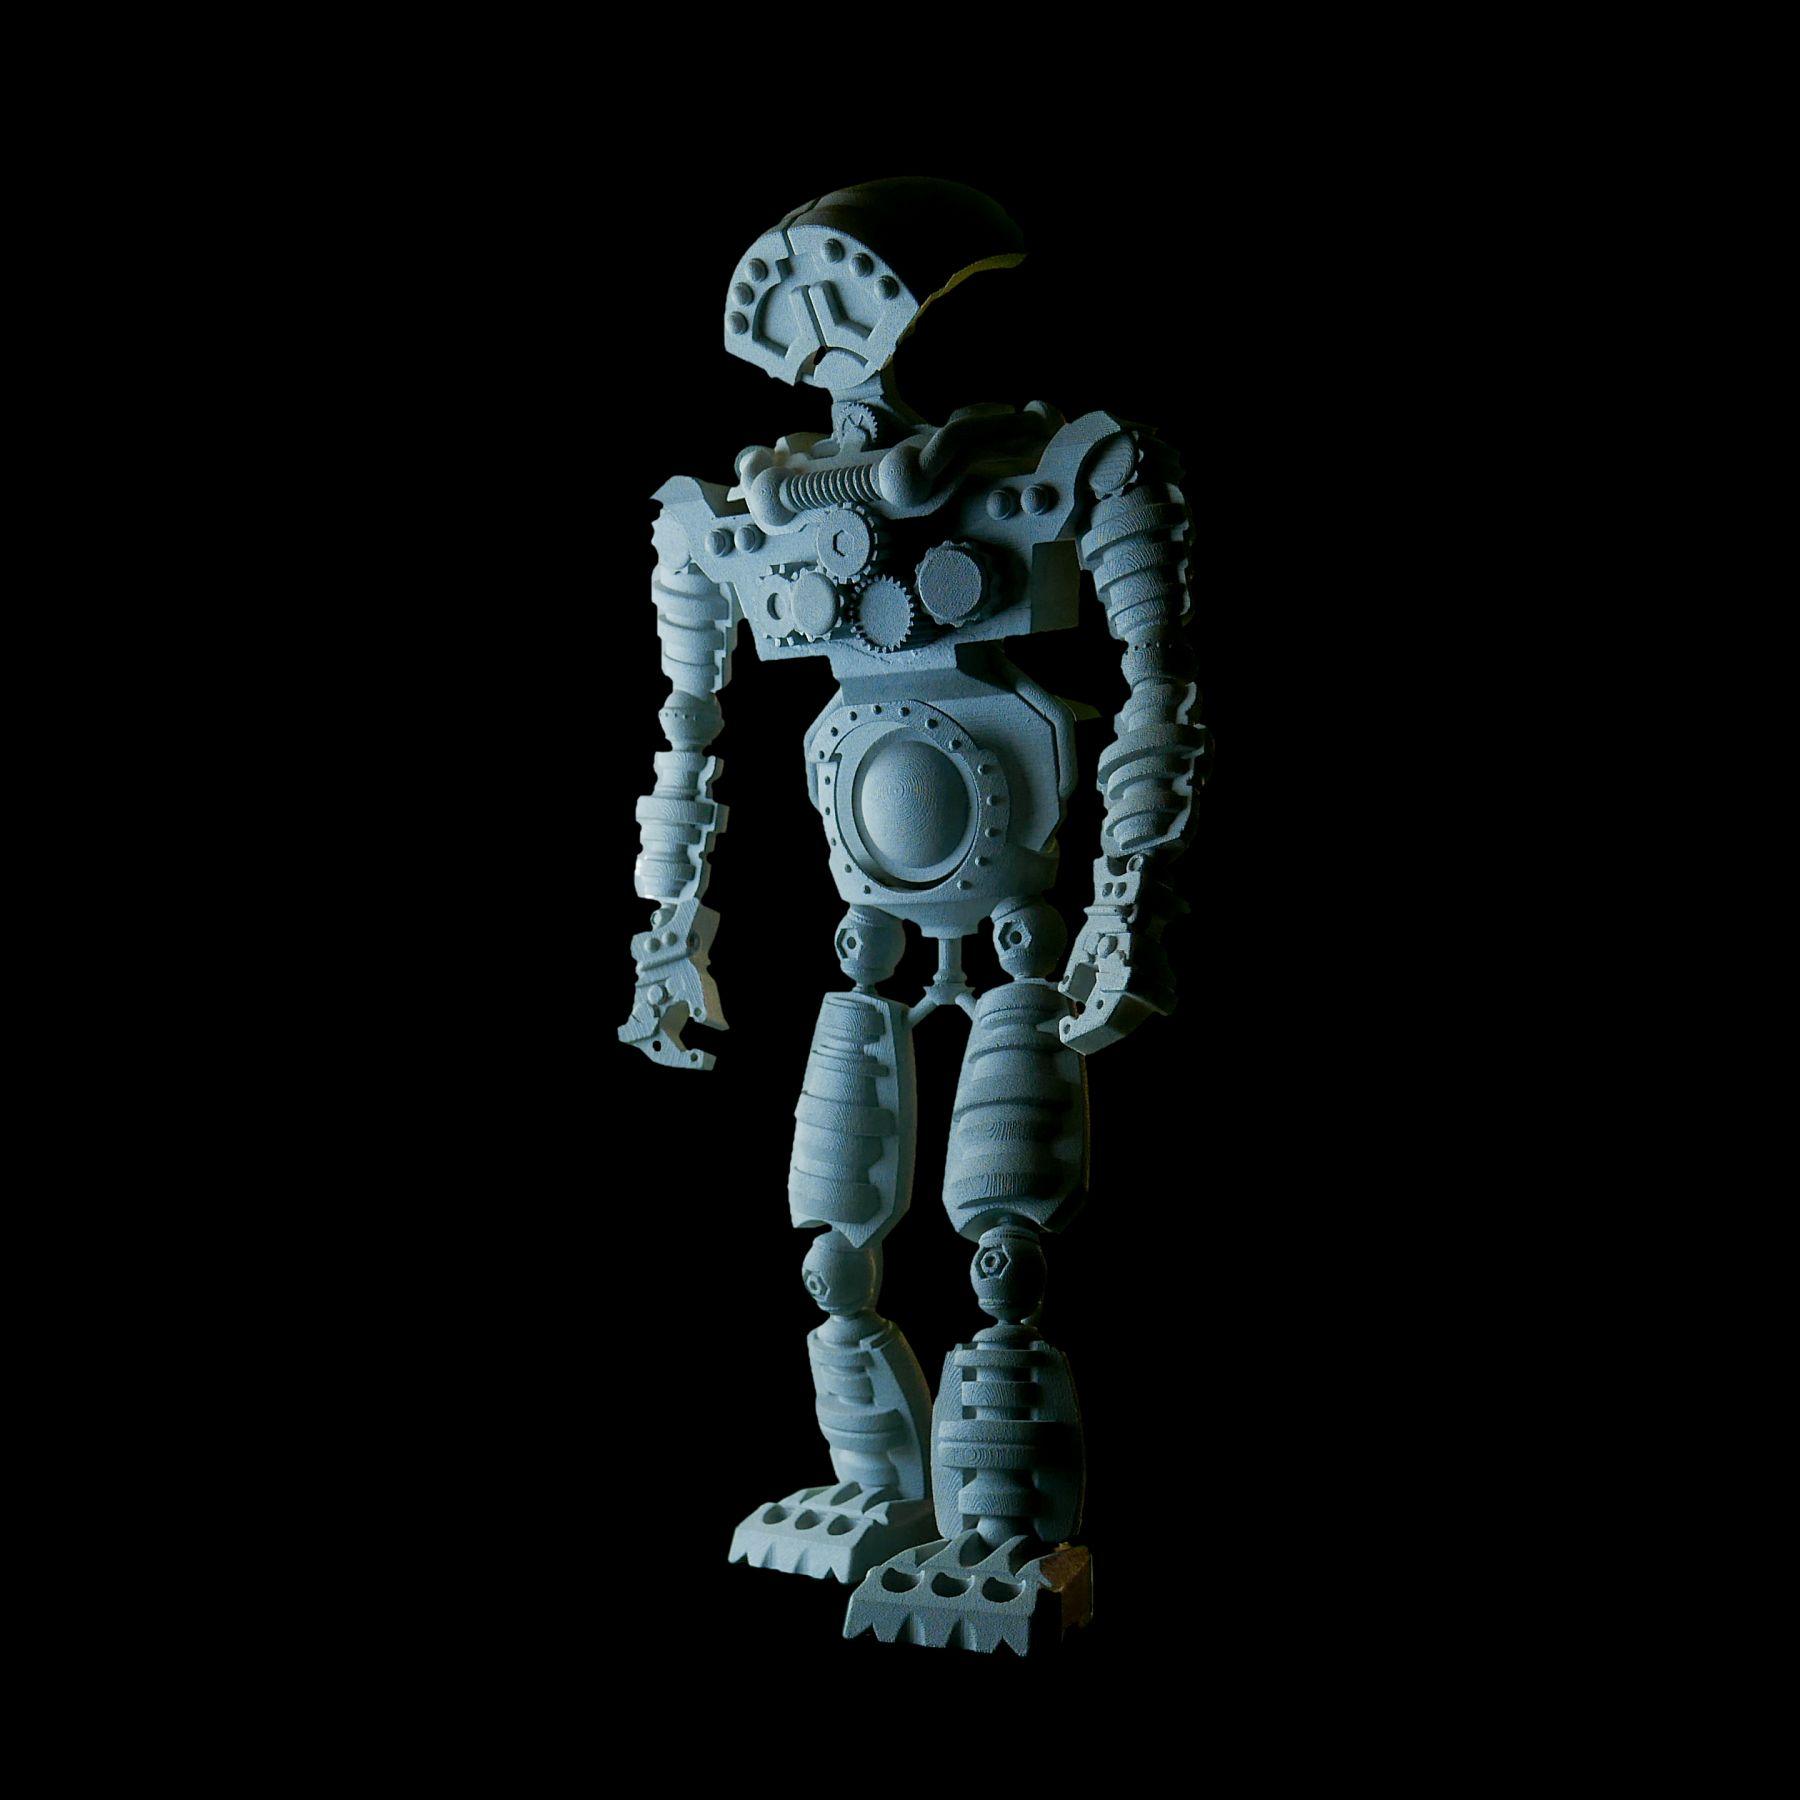 PETER SARKISIAN VideoMorphic Figure #6(Version 2) OFF, 2013